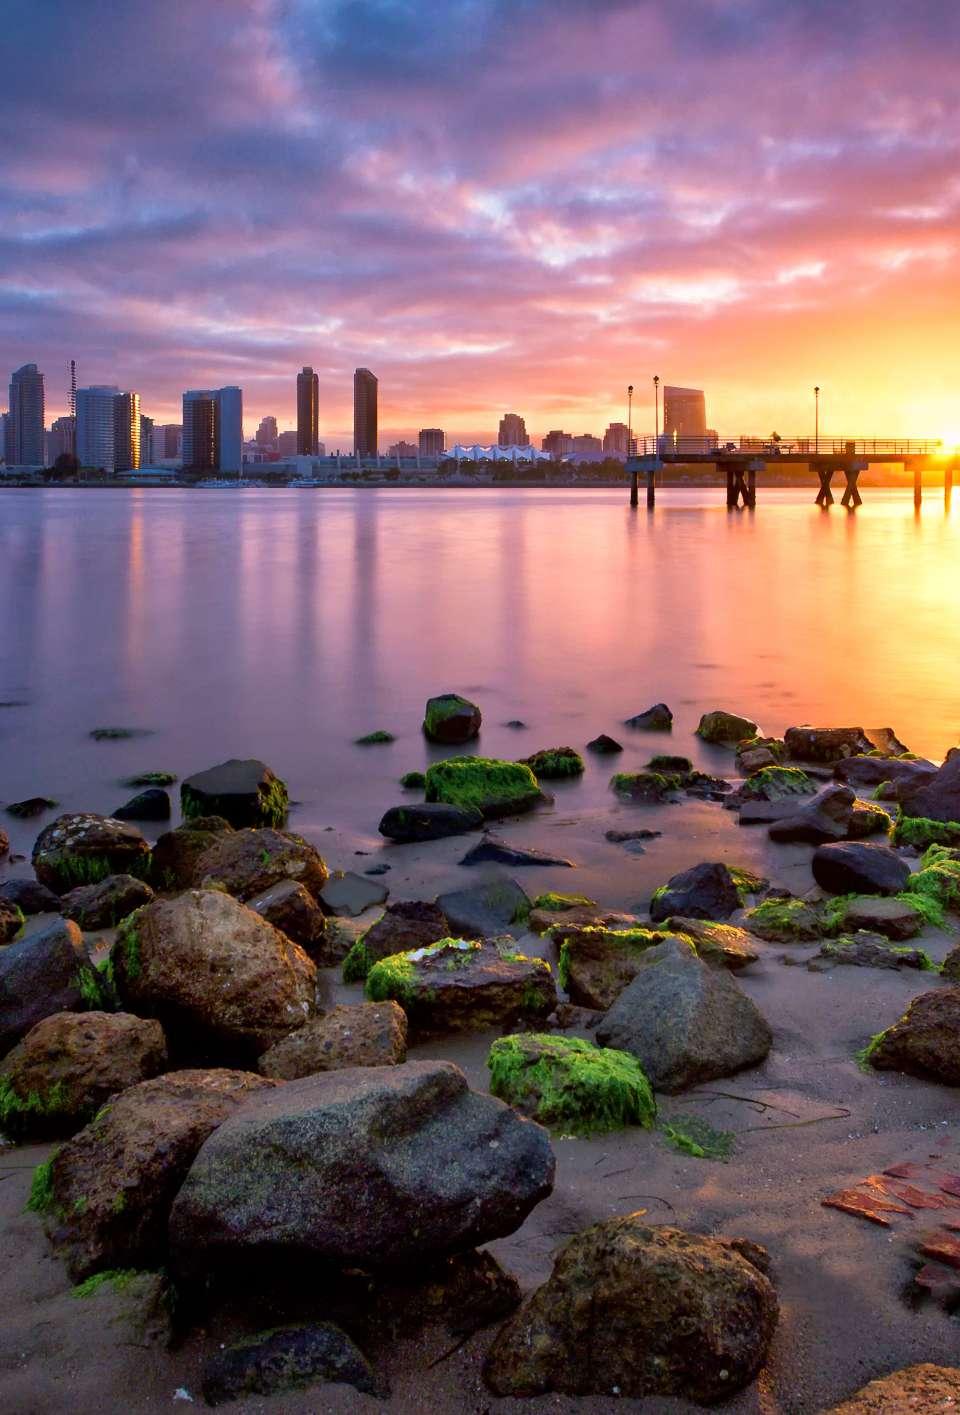 San Diego skyline from waterfront